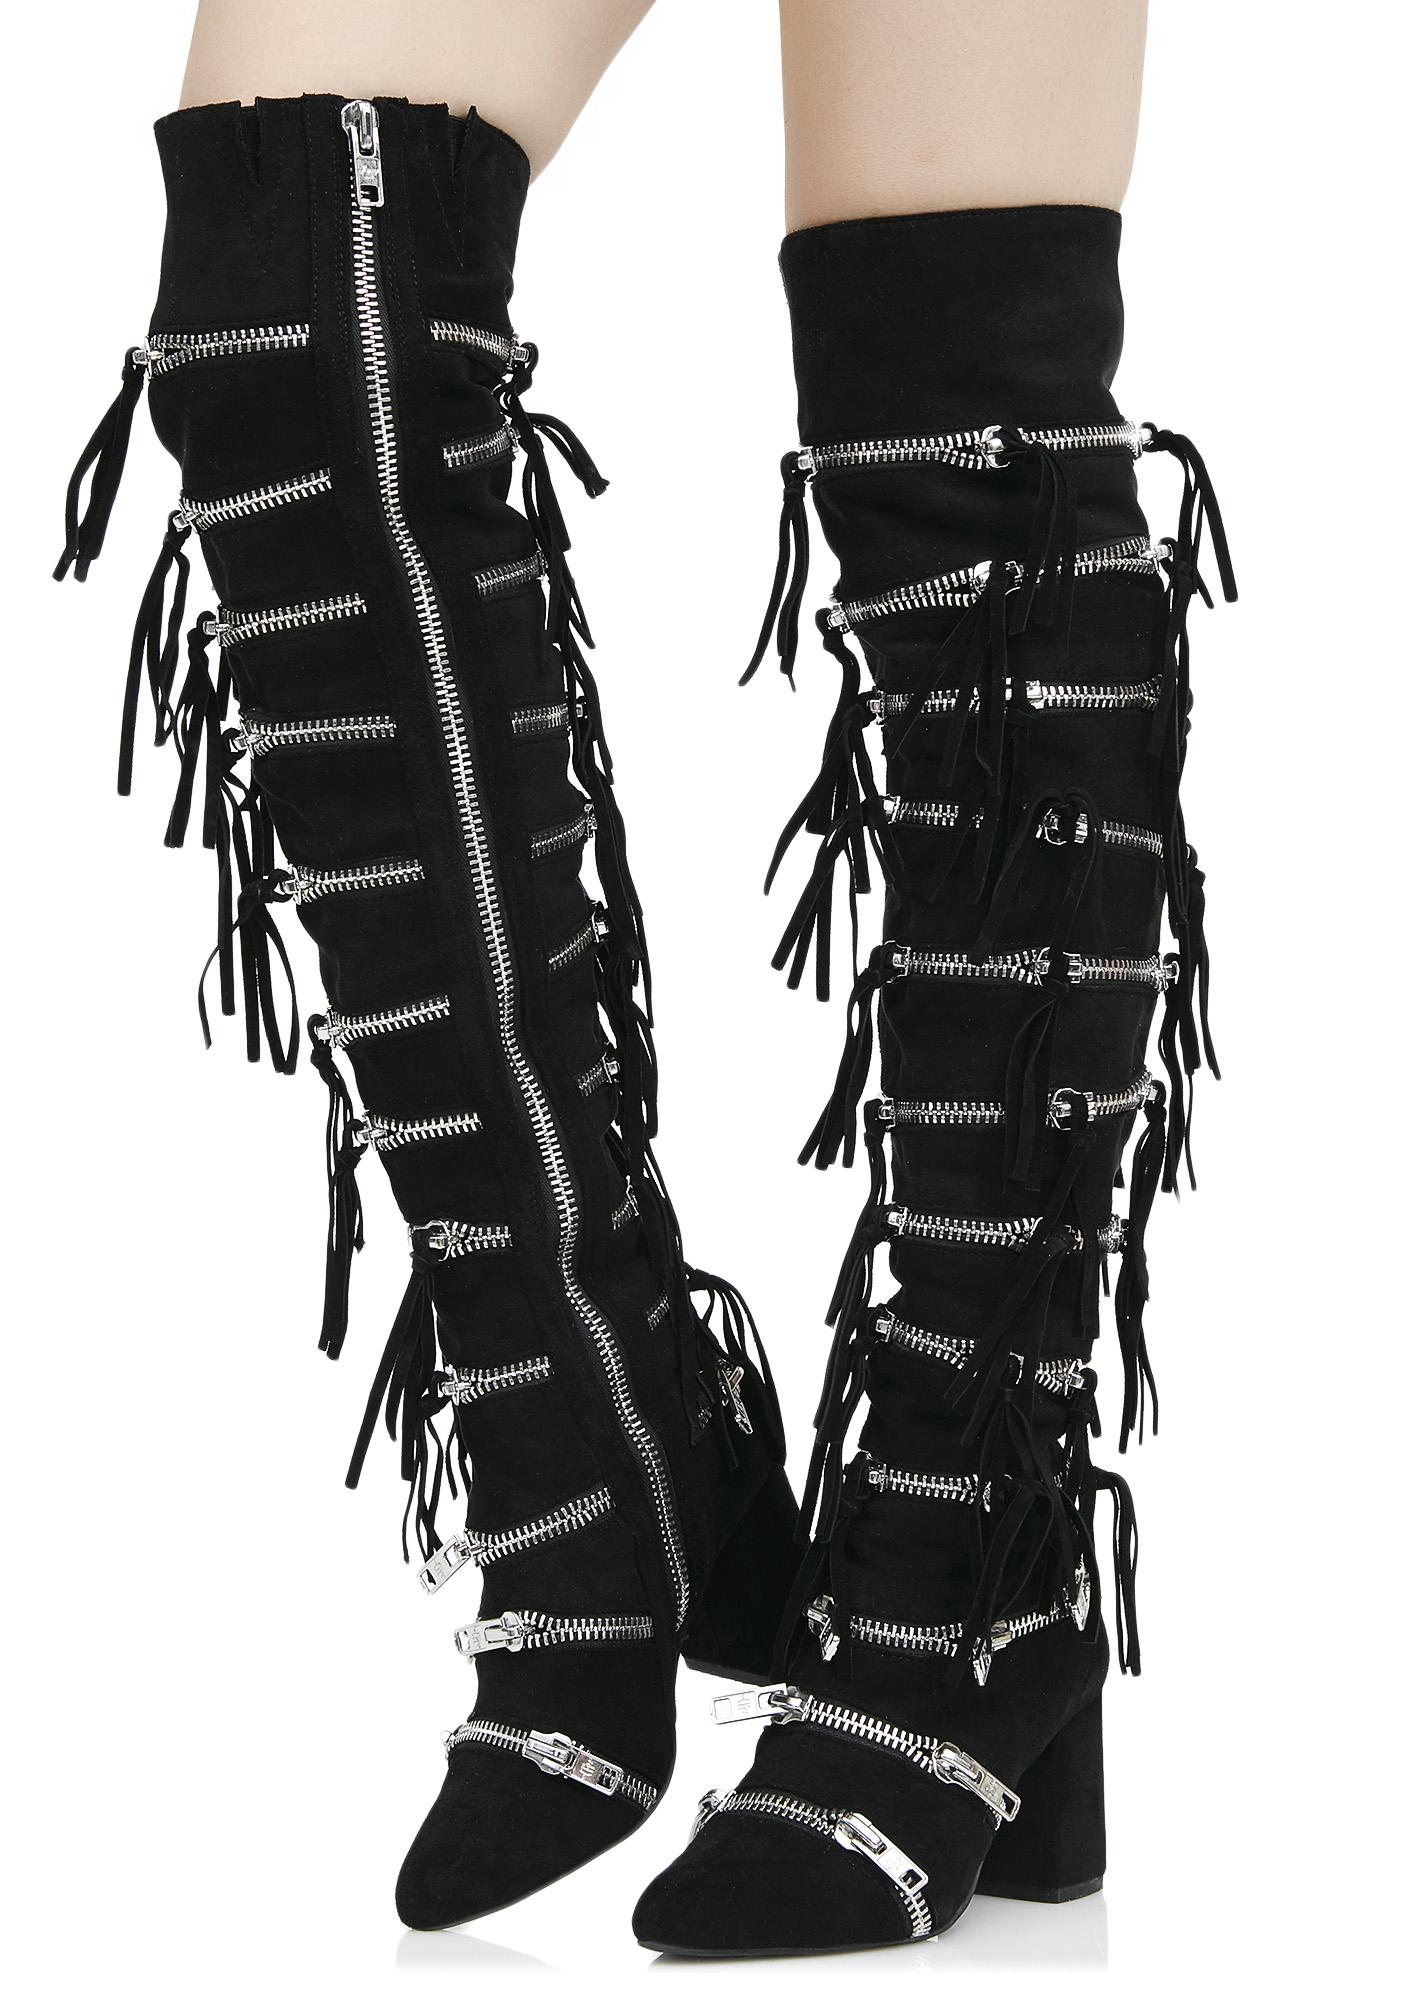 Current Mood Onyx Zip Boots